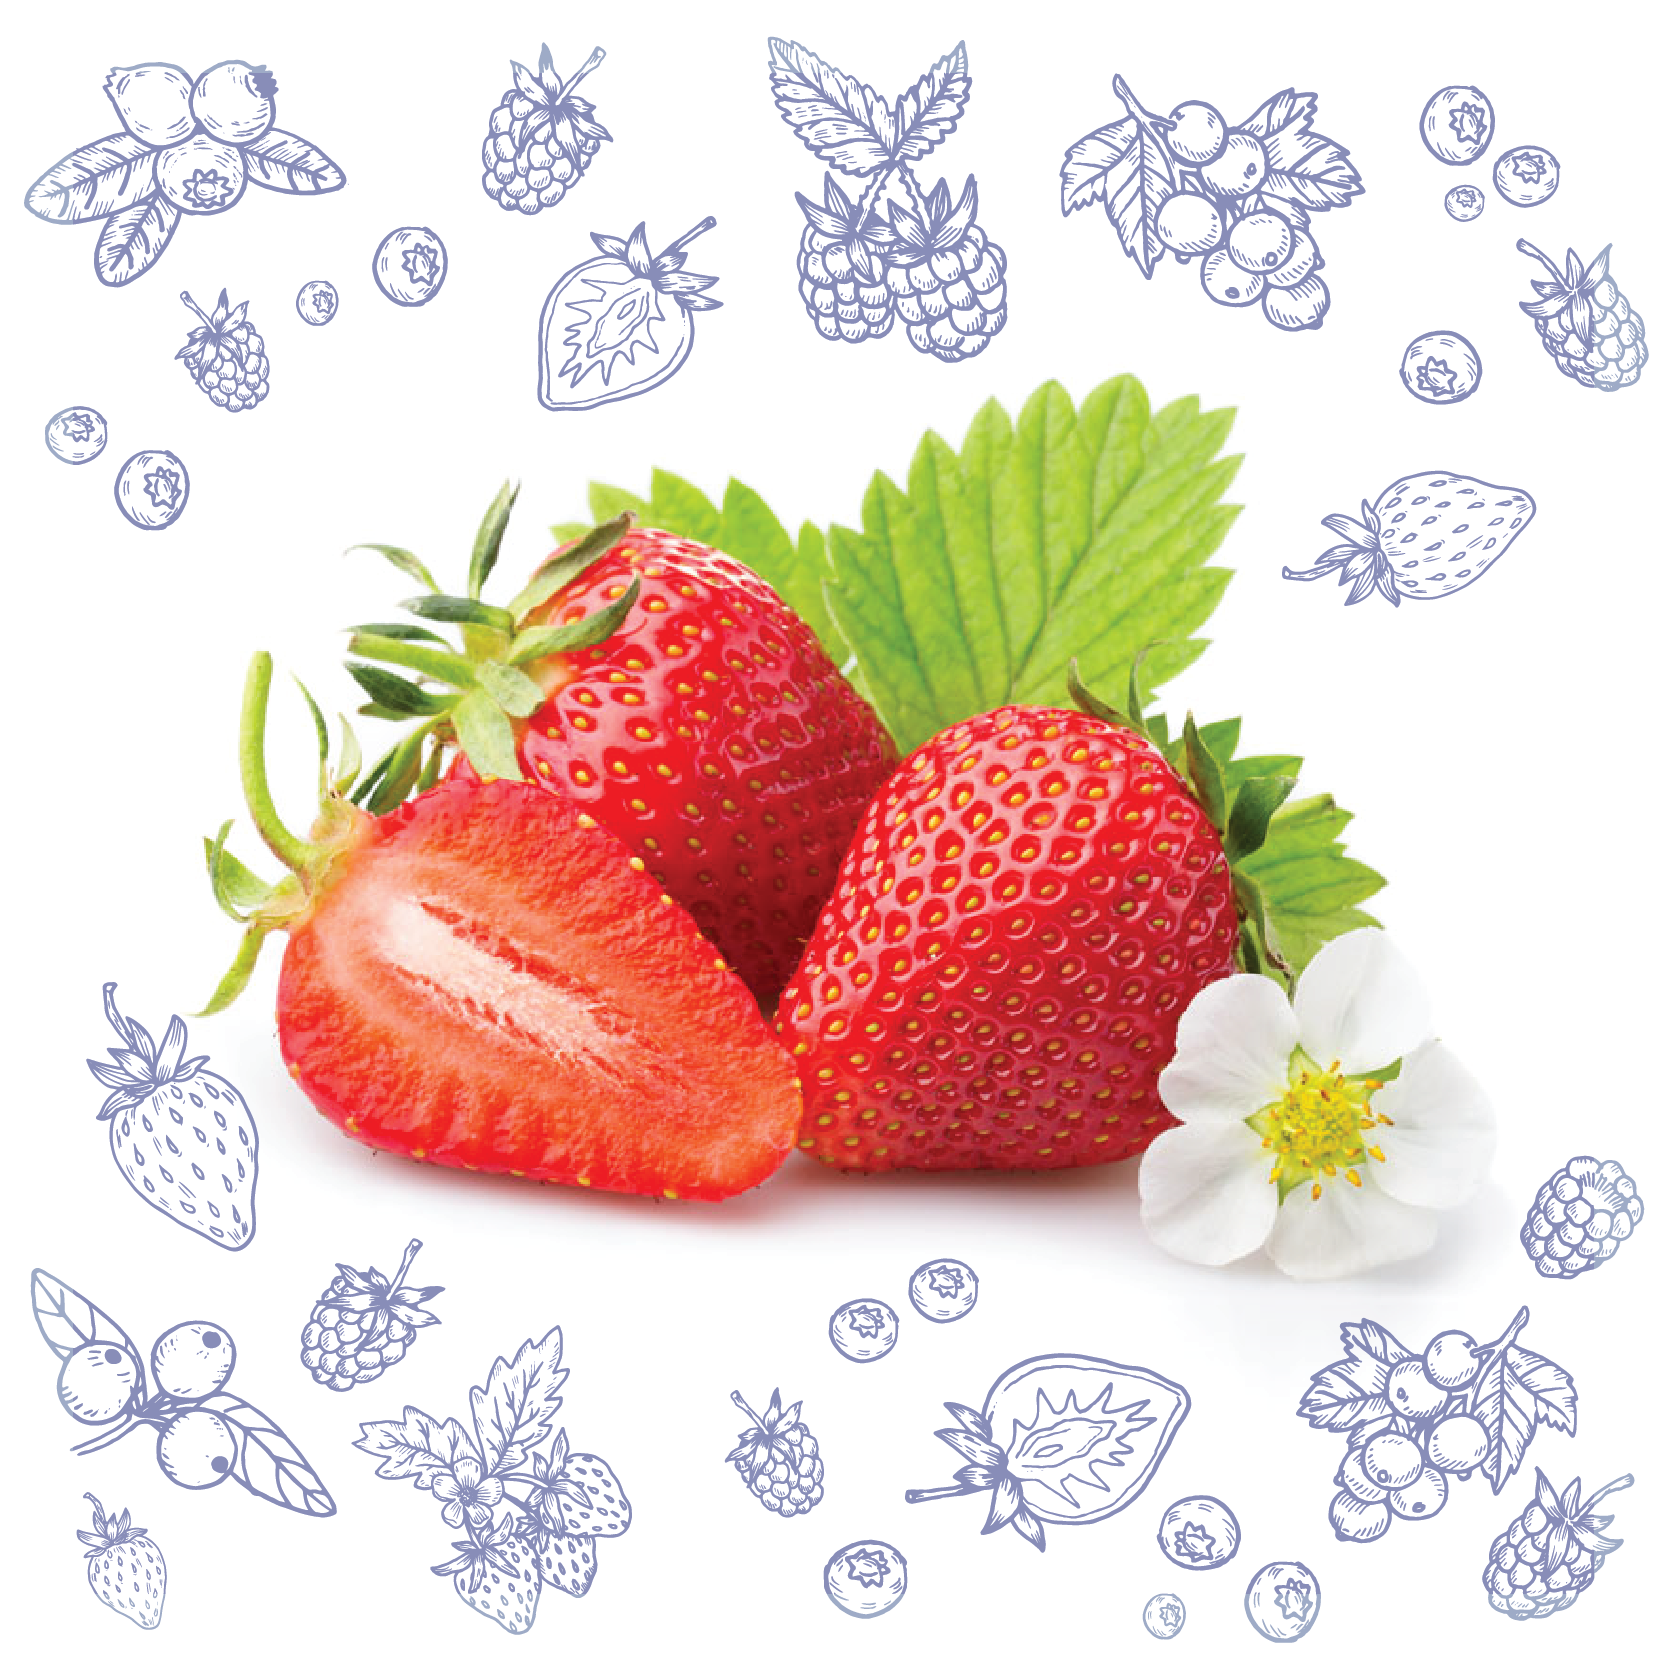 Polarica-Berries-mansikka